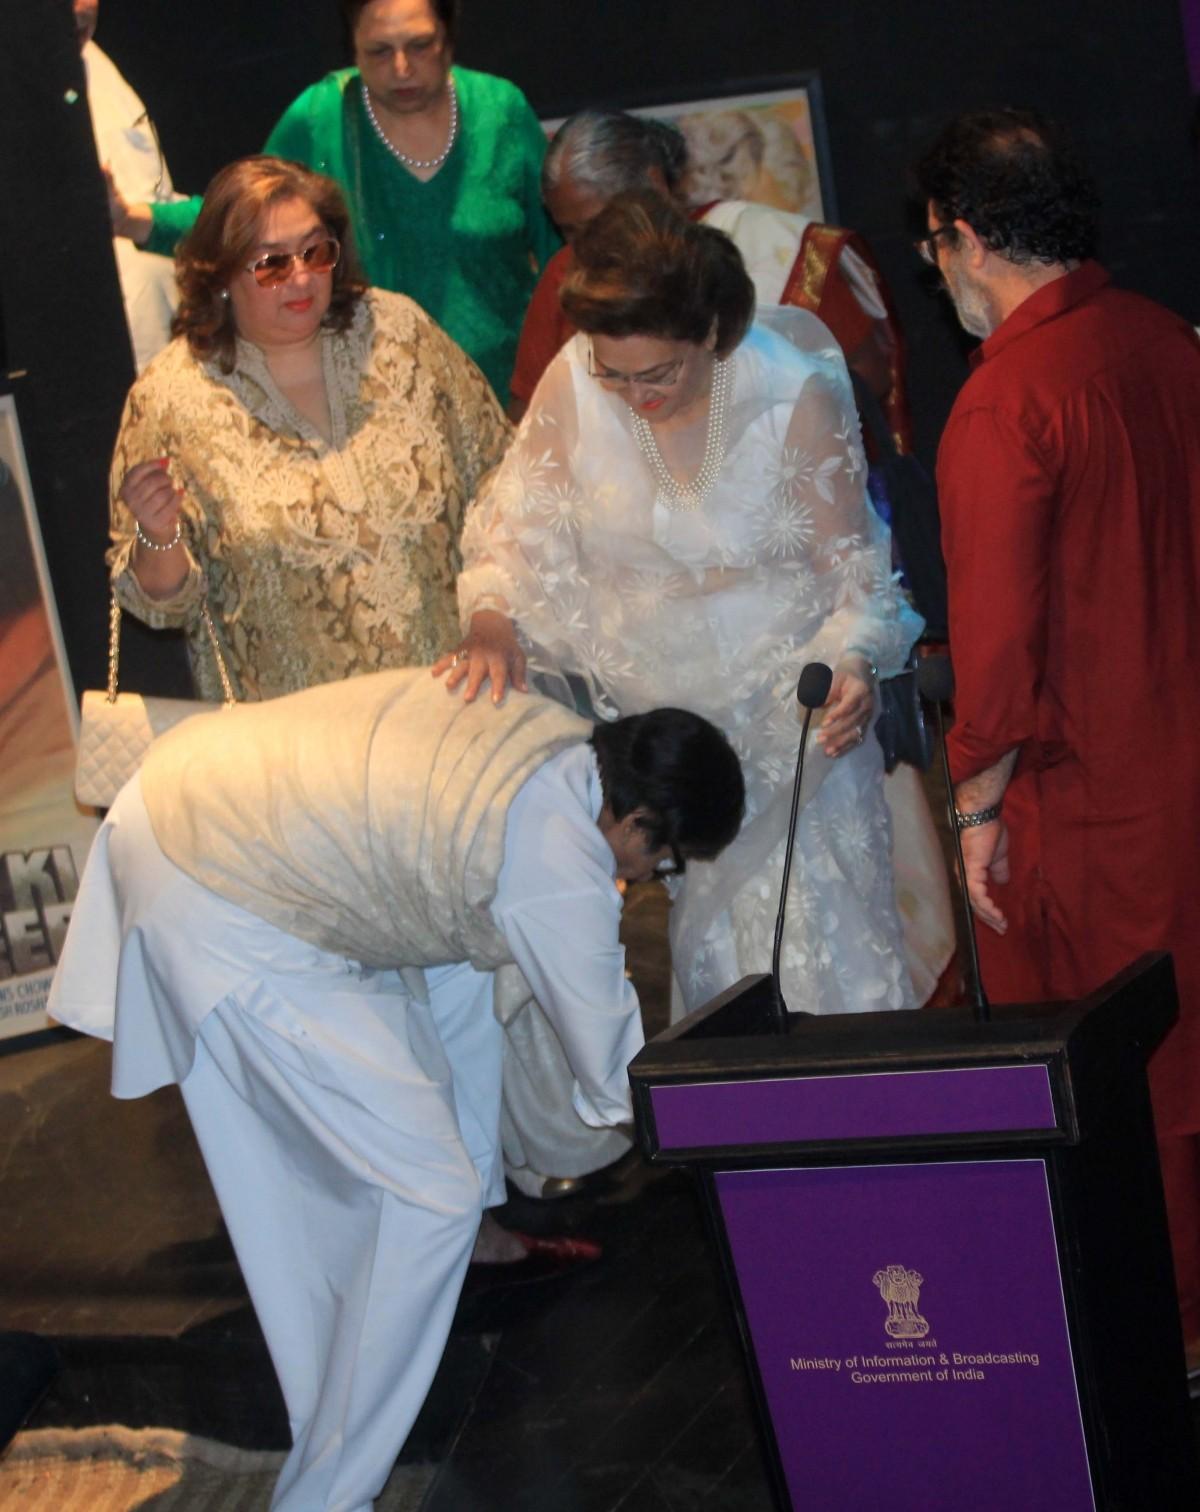 Shashi Kapoor Receives Dadasaheb Phalke Award